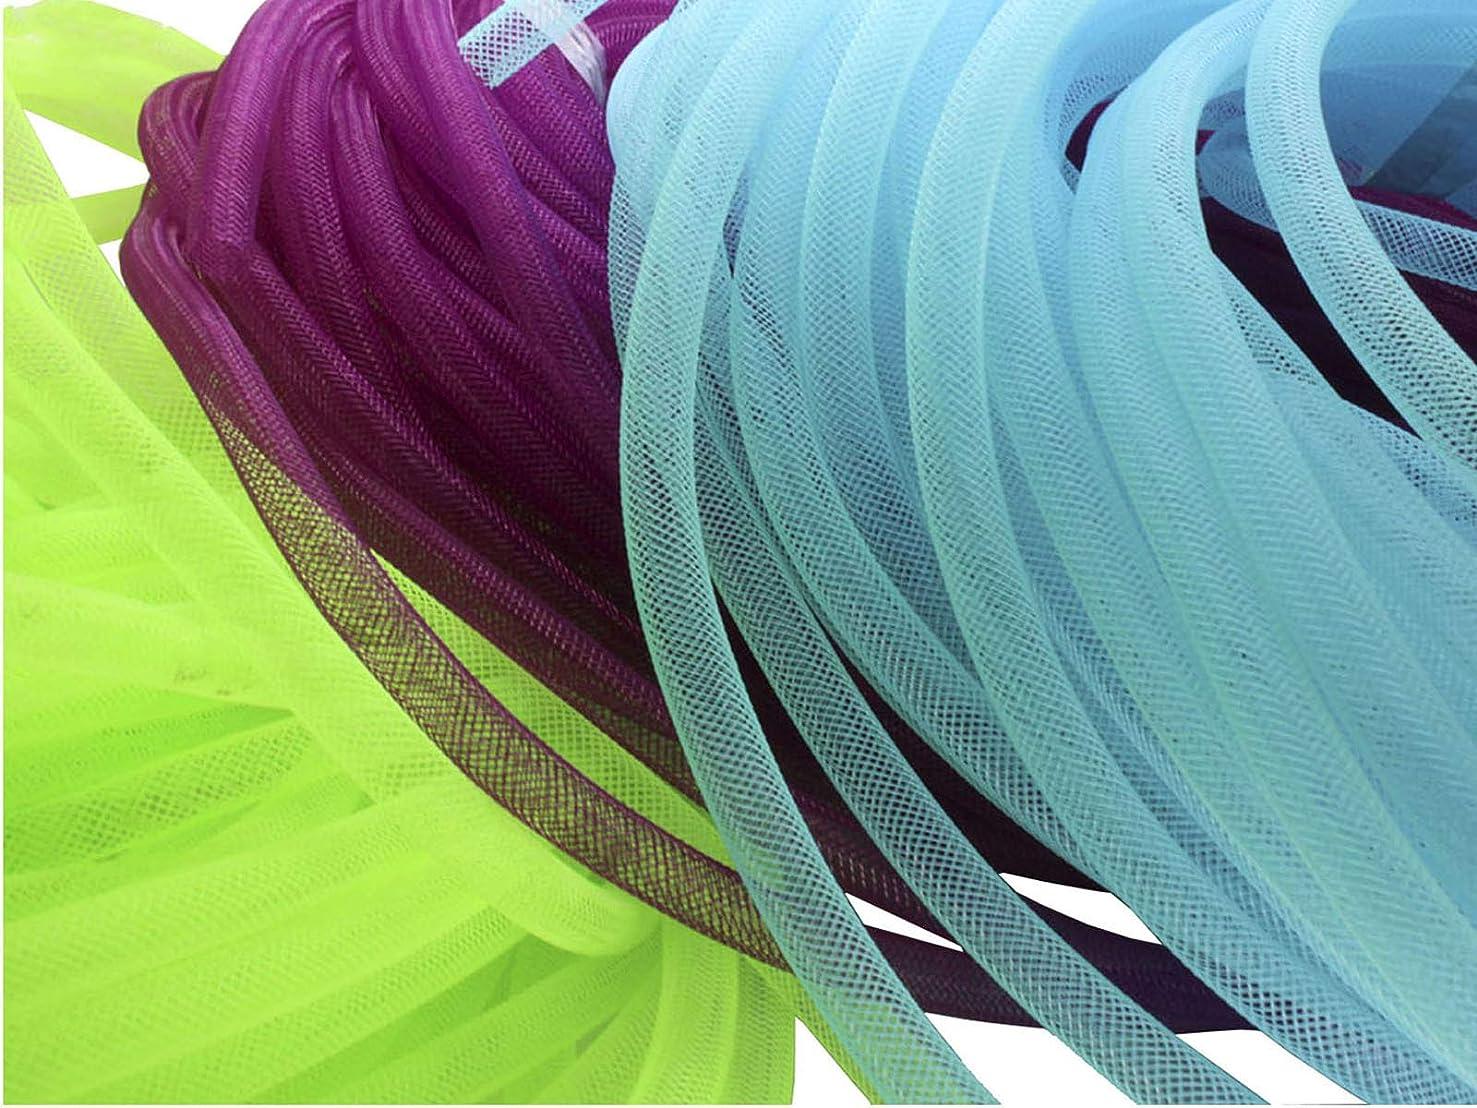 Menghuan 80 Yards(16 bundles) Mesh Tubing Cord 8mm Fashion Bracelet/Necklace Cord Jewelry Accessory